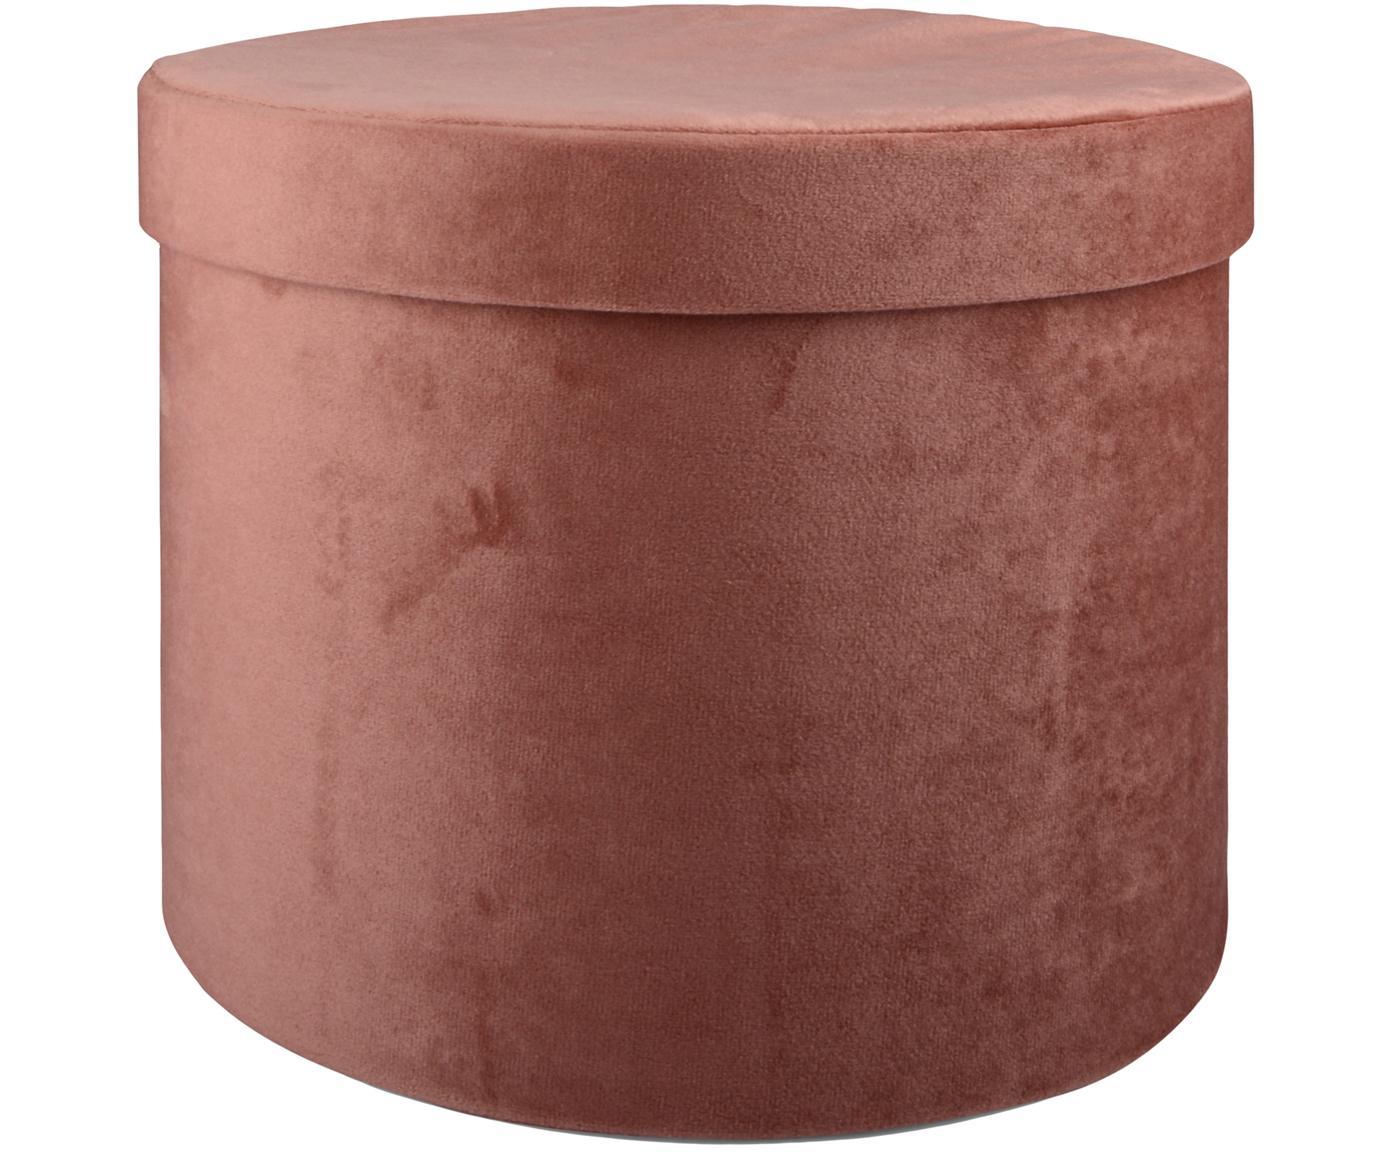 Fluwelen geschenkdozen Ivetta, 2 stuks, Fluweel, Roze, Ø 29 x H 22 cm